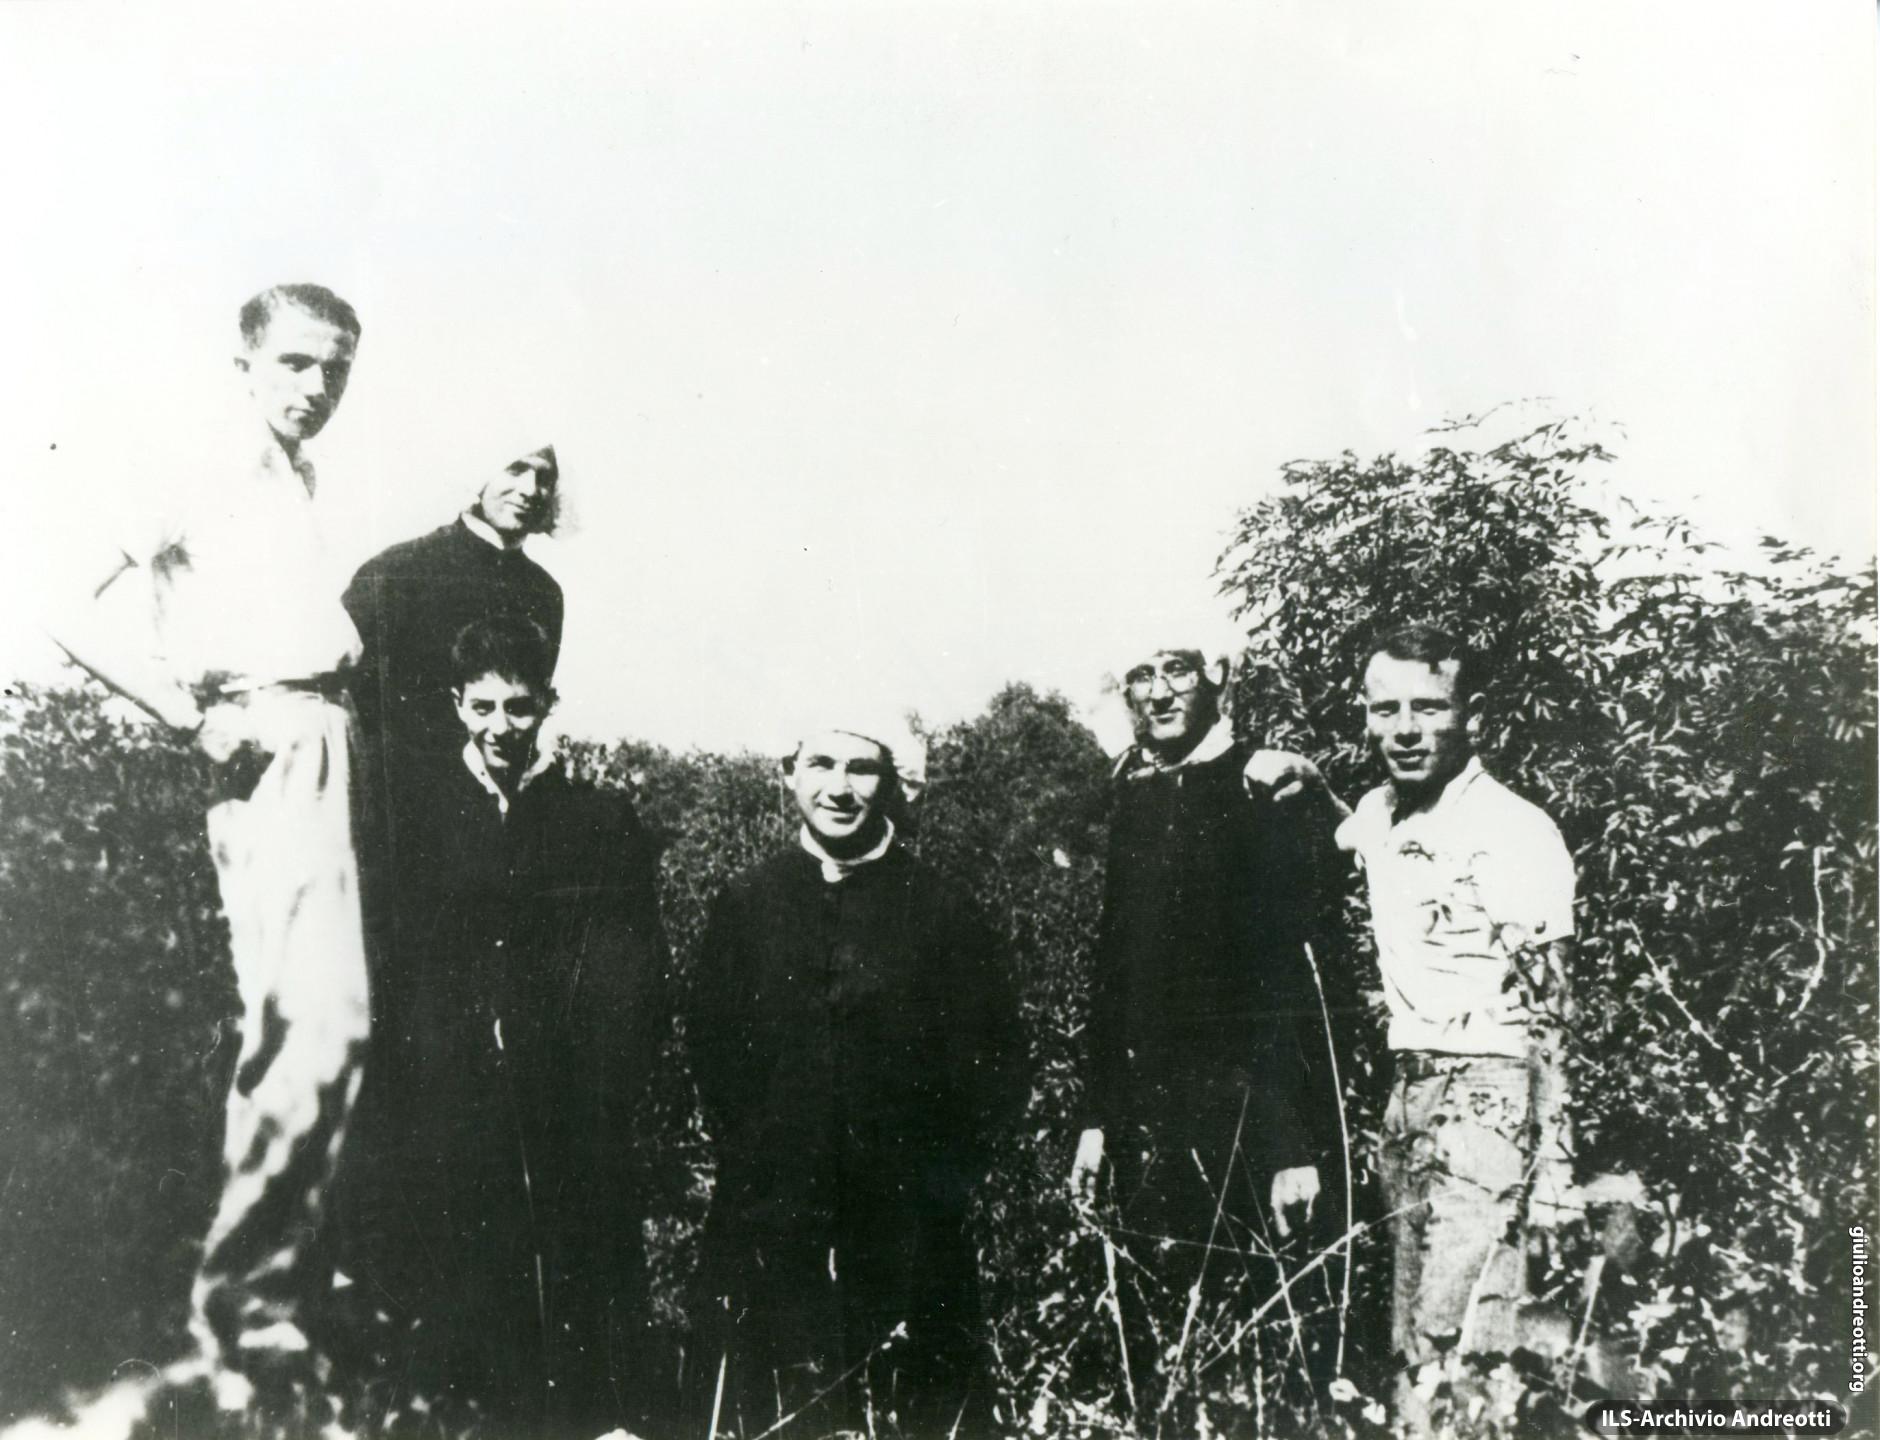 Andreotti a Segni con alcuni amici fra i quali i futuri cardinali Vincenzo Fagiolo e Angelo Felici.